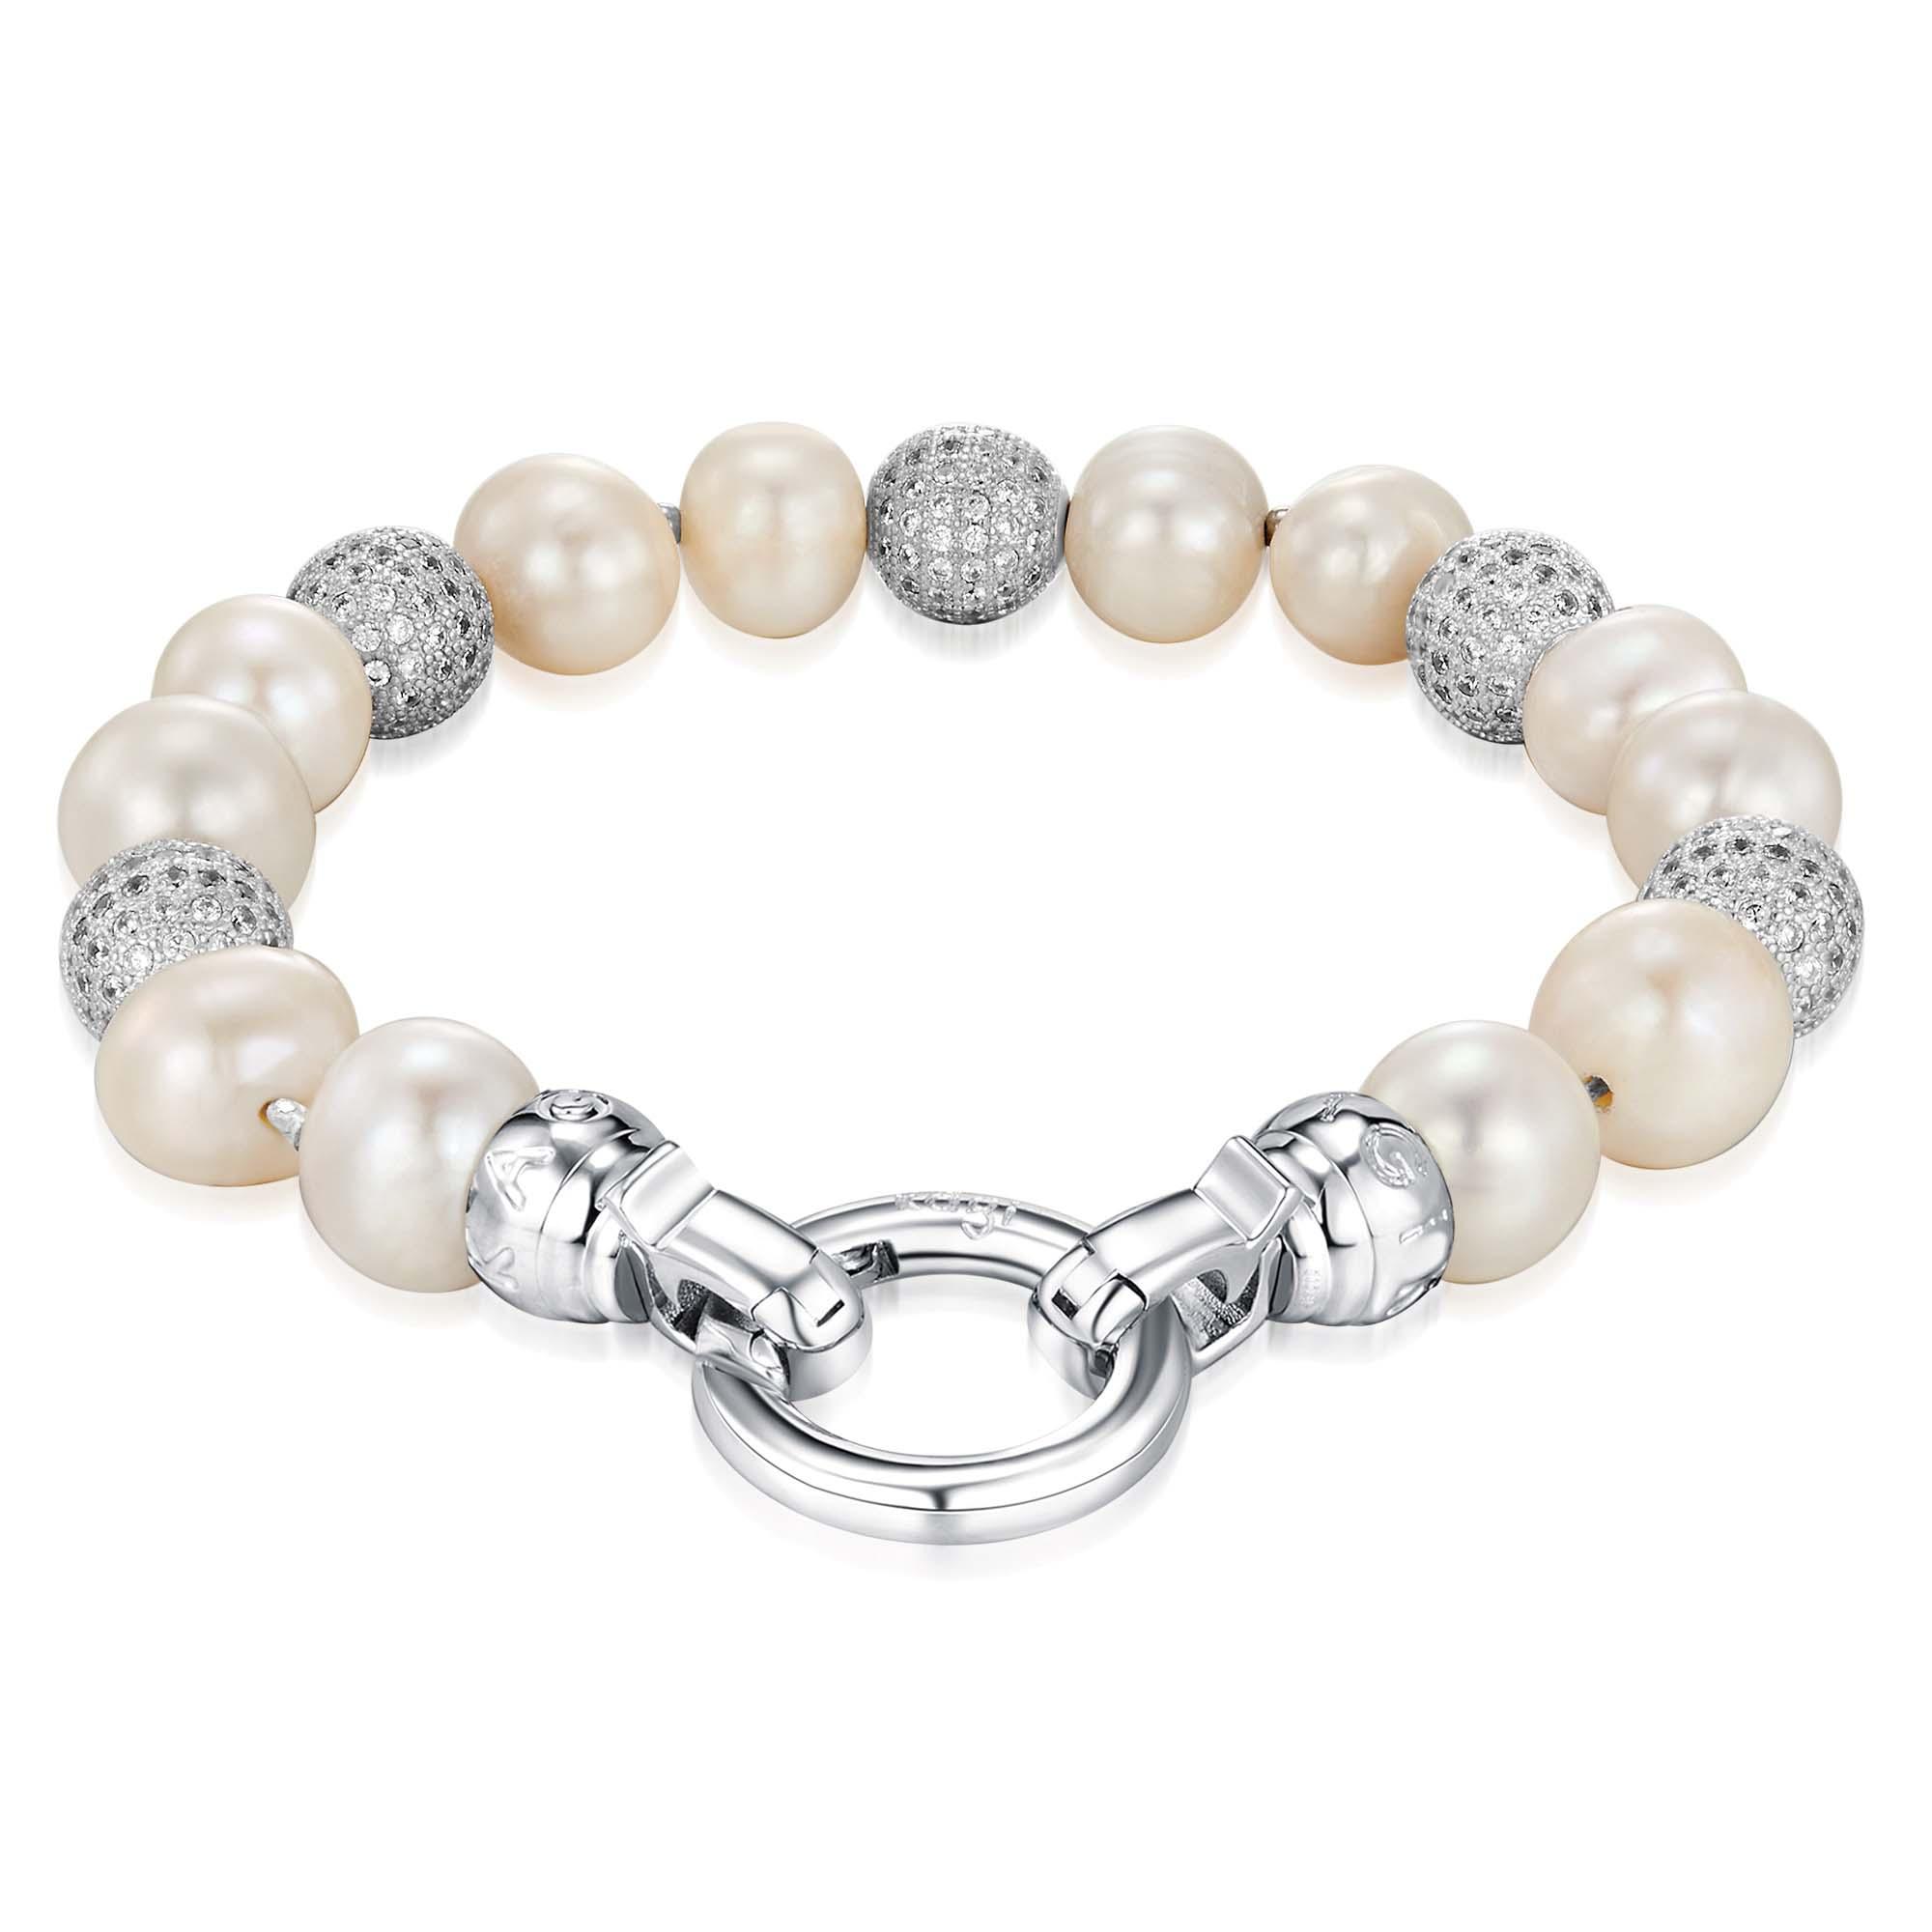 Kagi Pearl Luxe Bracelet $169 www.kagi.net